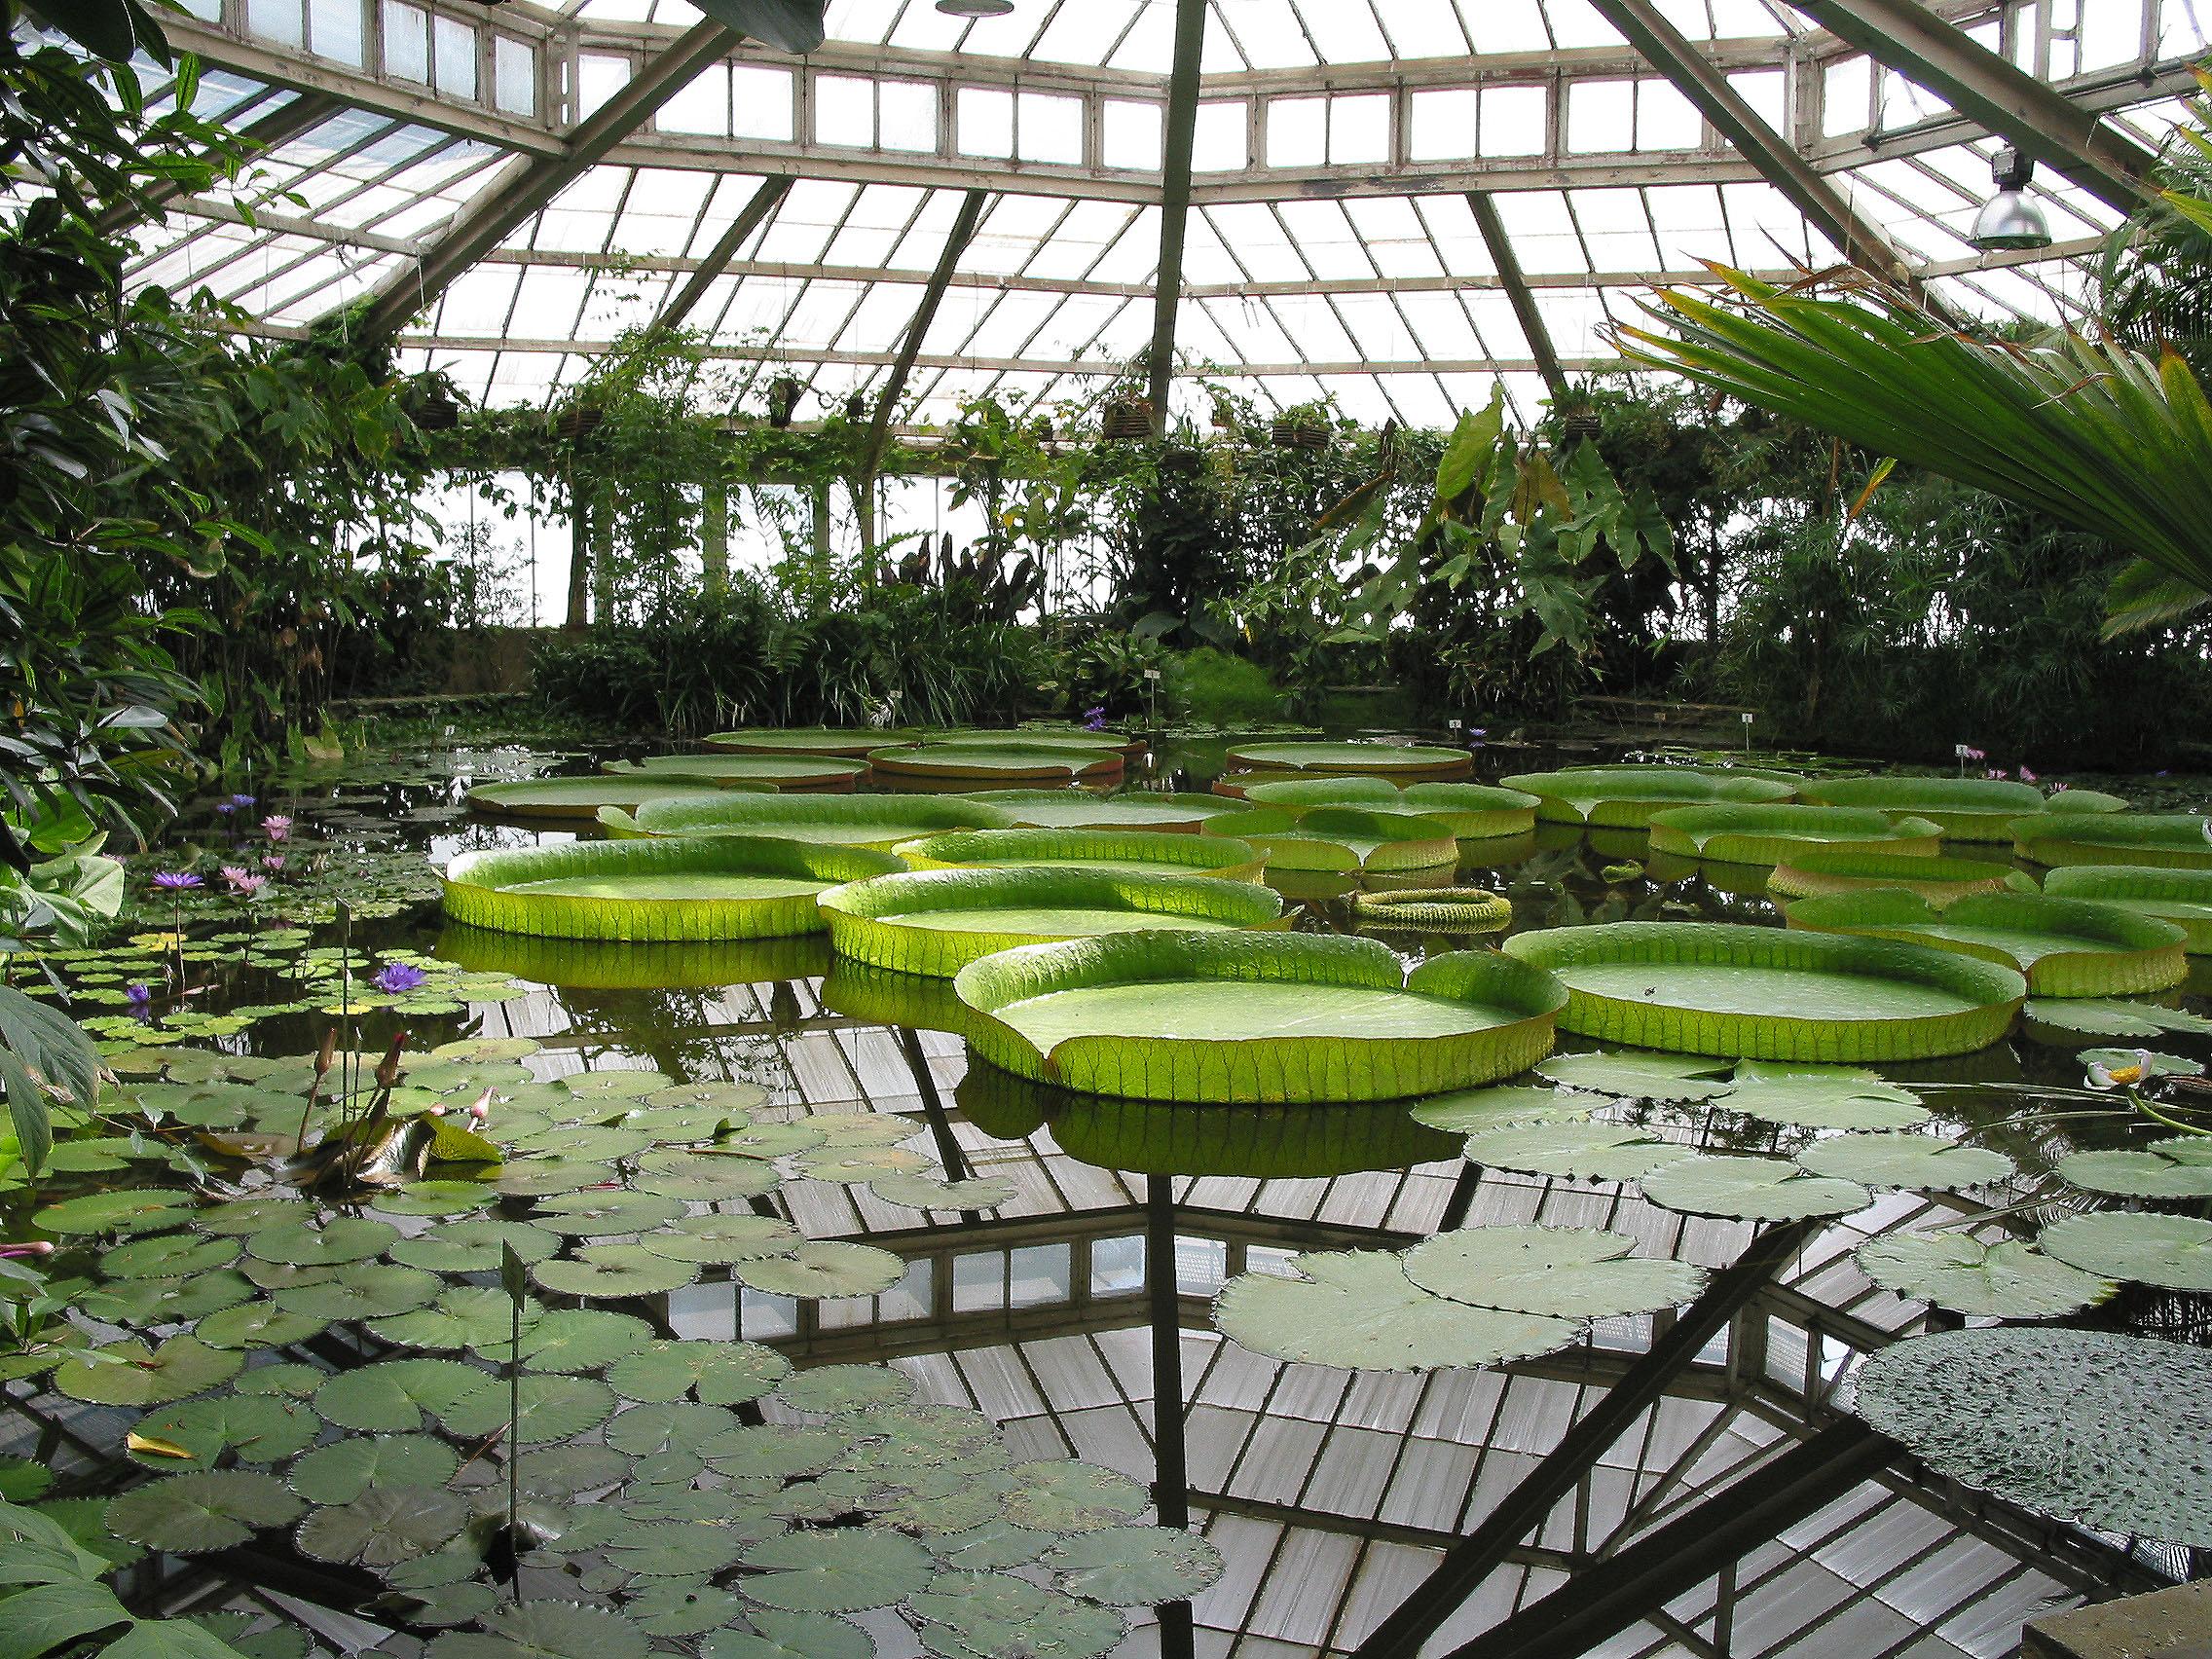 Jardin botanique national de belgique for Jardin belgique